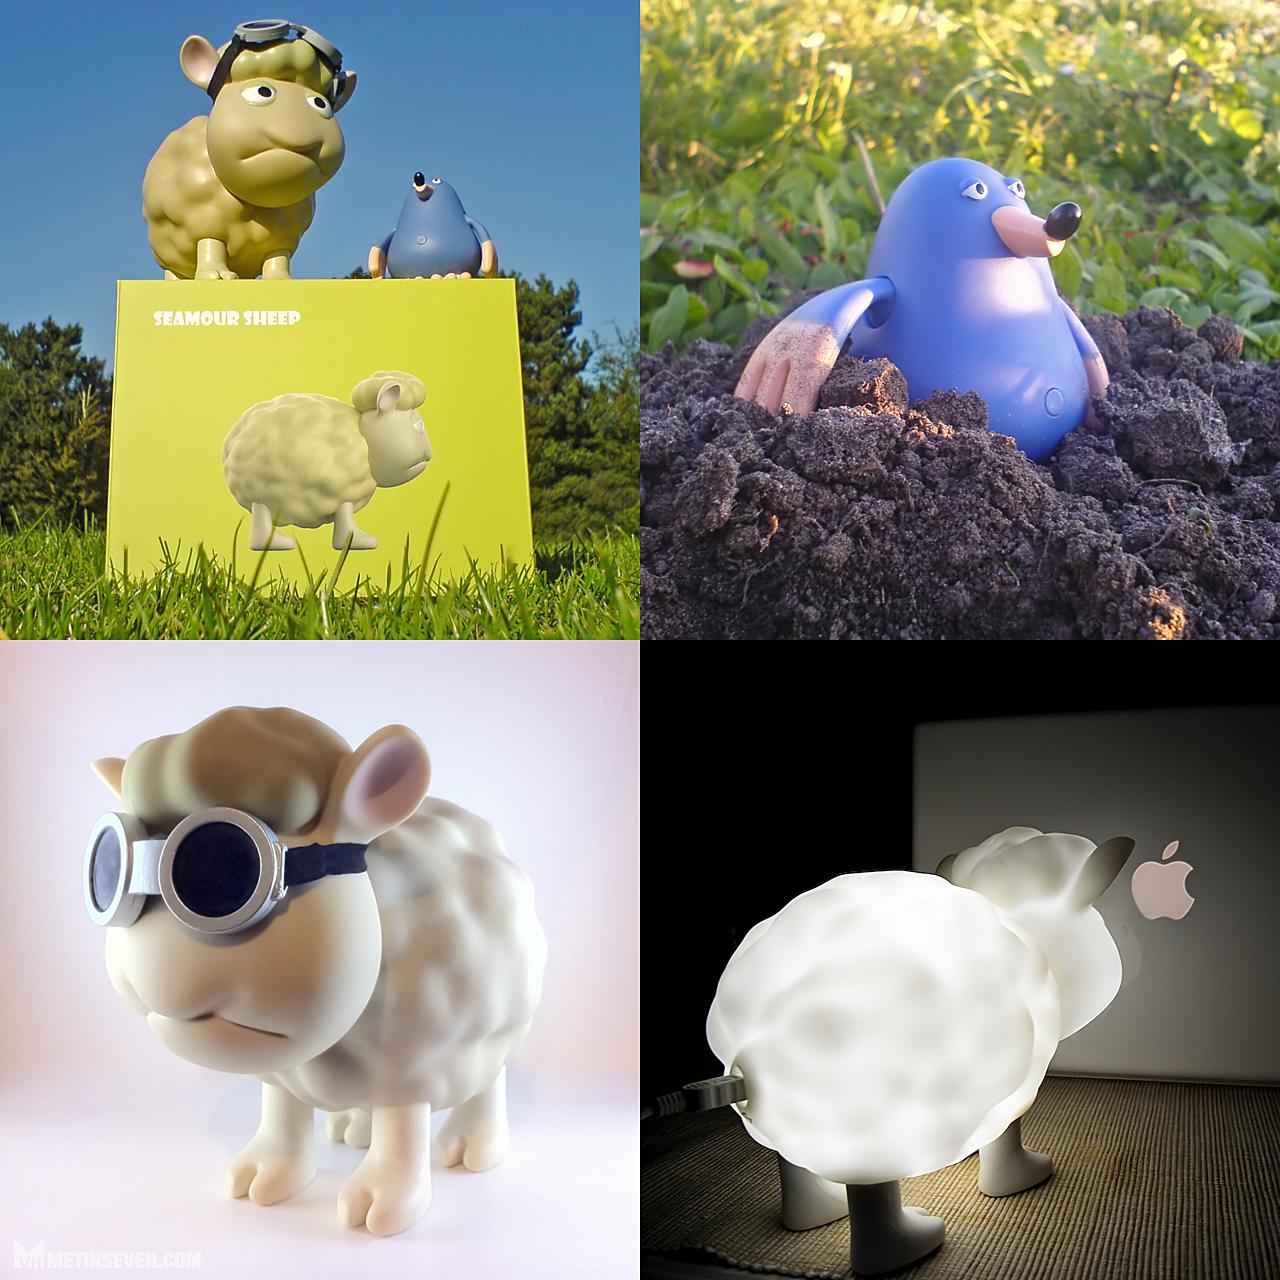 sheep-marty-mole.png